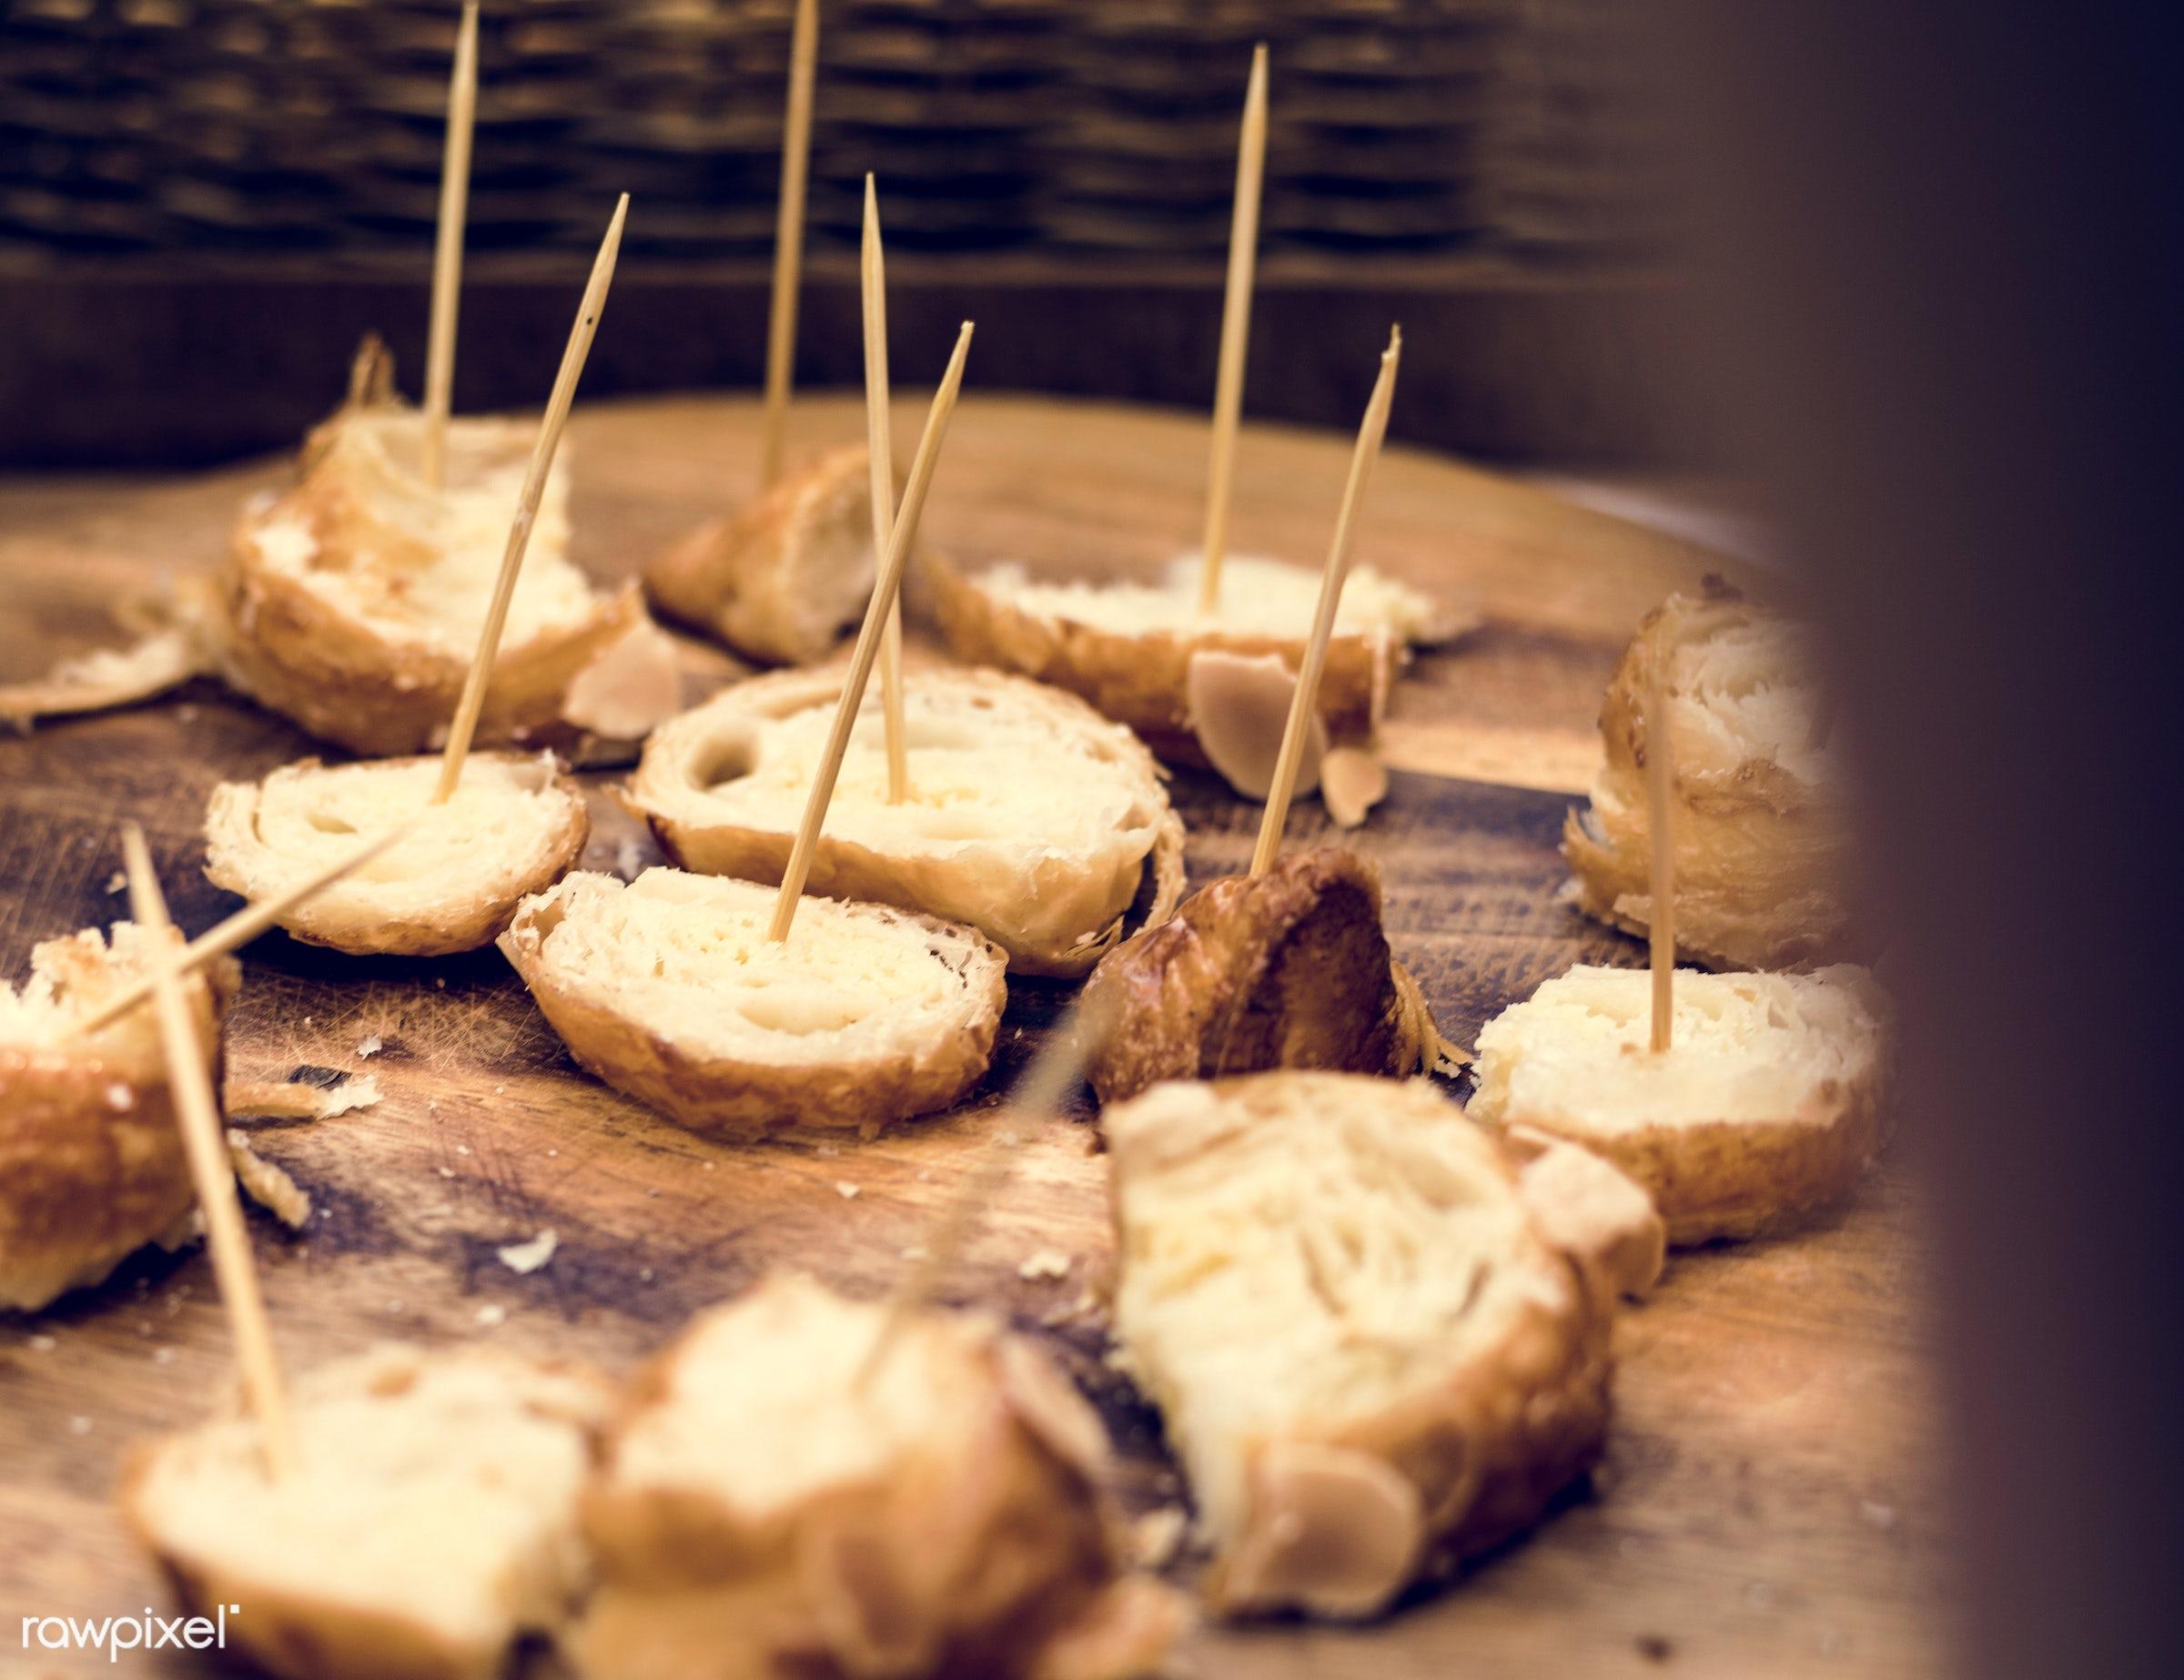 grocery, shop, nobody, cutout, stall, pastries, cuisine, test, bake, goods, homemade, baked, toothpick, taste, bakery, fresh...